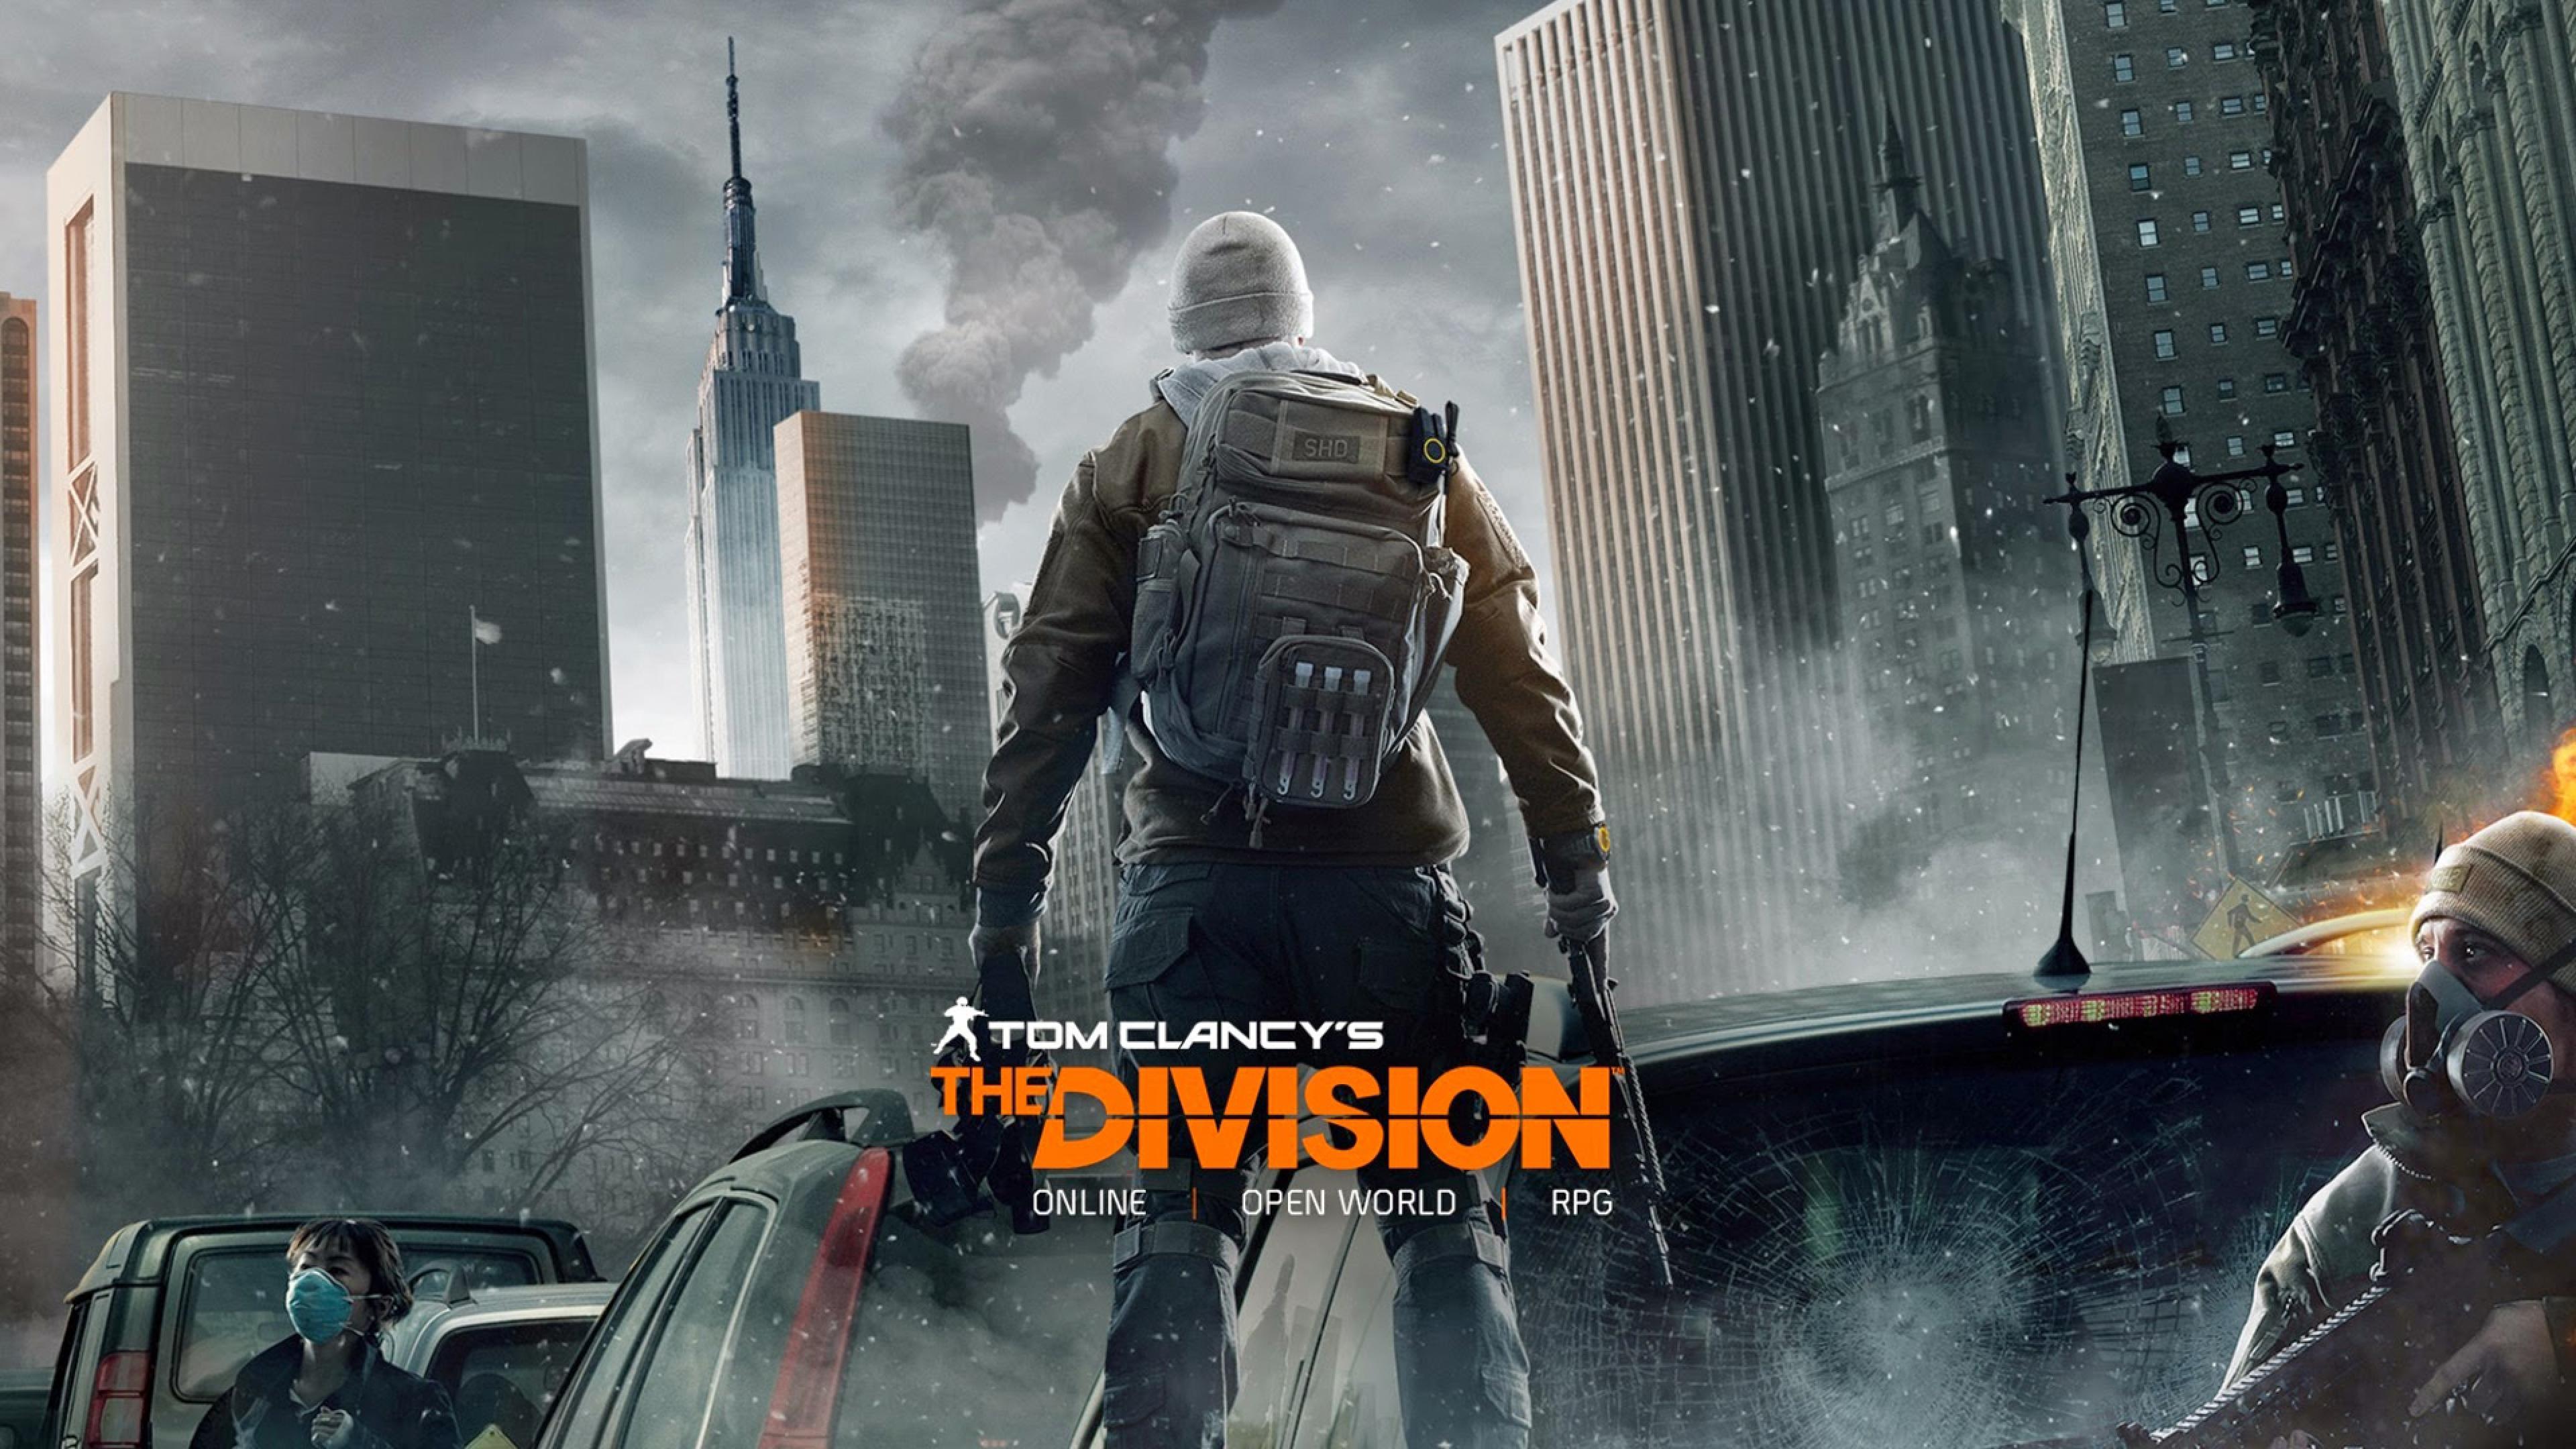 tom clancys the division 2016 1535966355 - Tom Clancys The Division 2016 - xbox games wallpapers, tom clancys the division wallpapers, ps4 wallpapers, games wallpapers